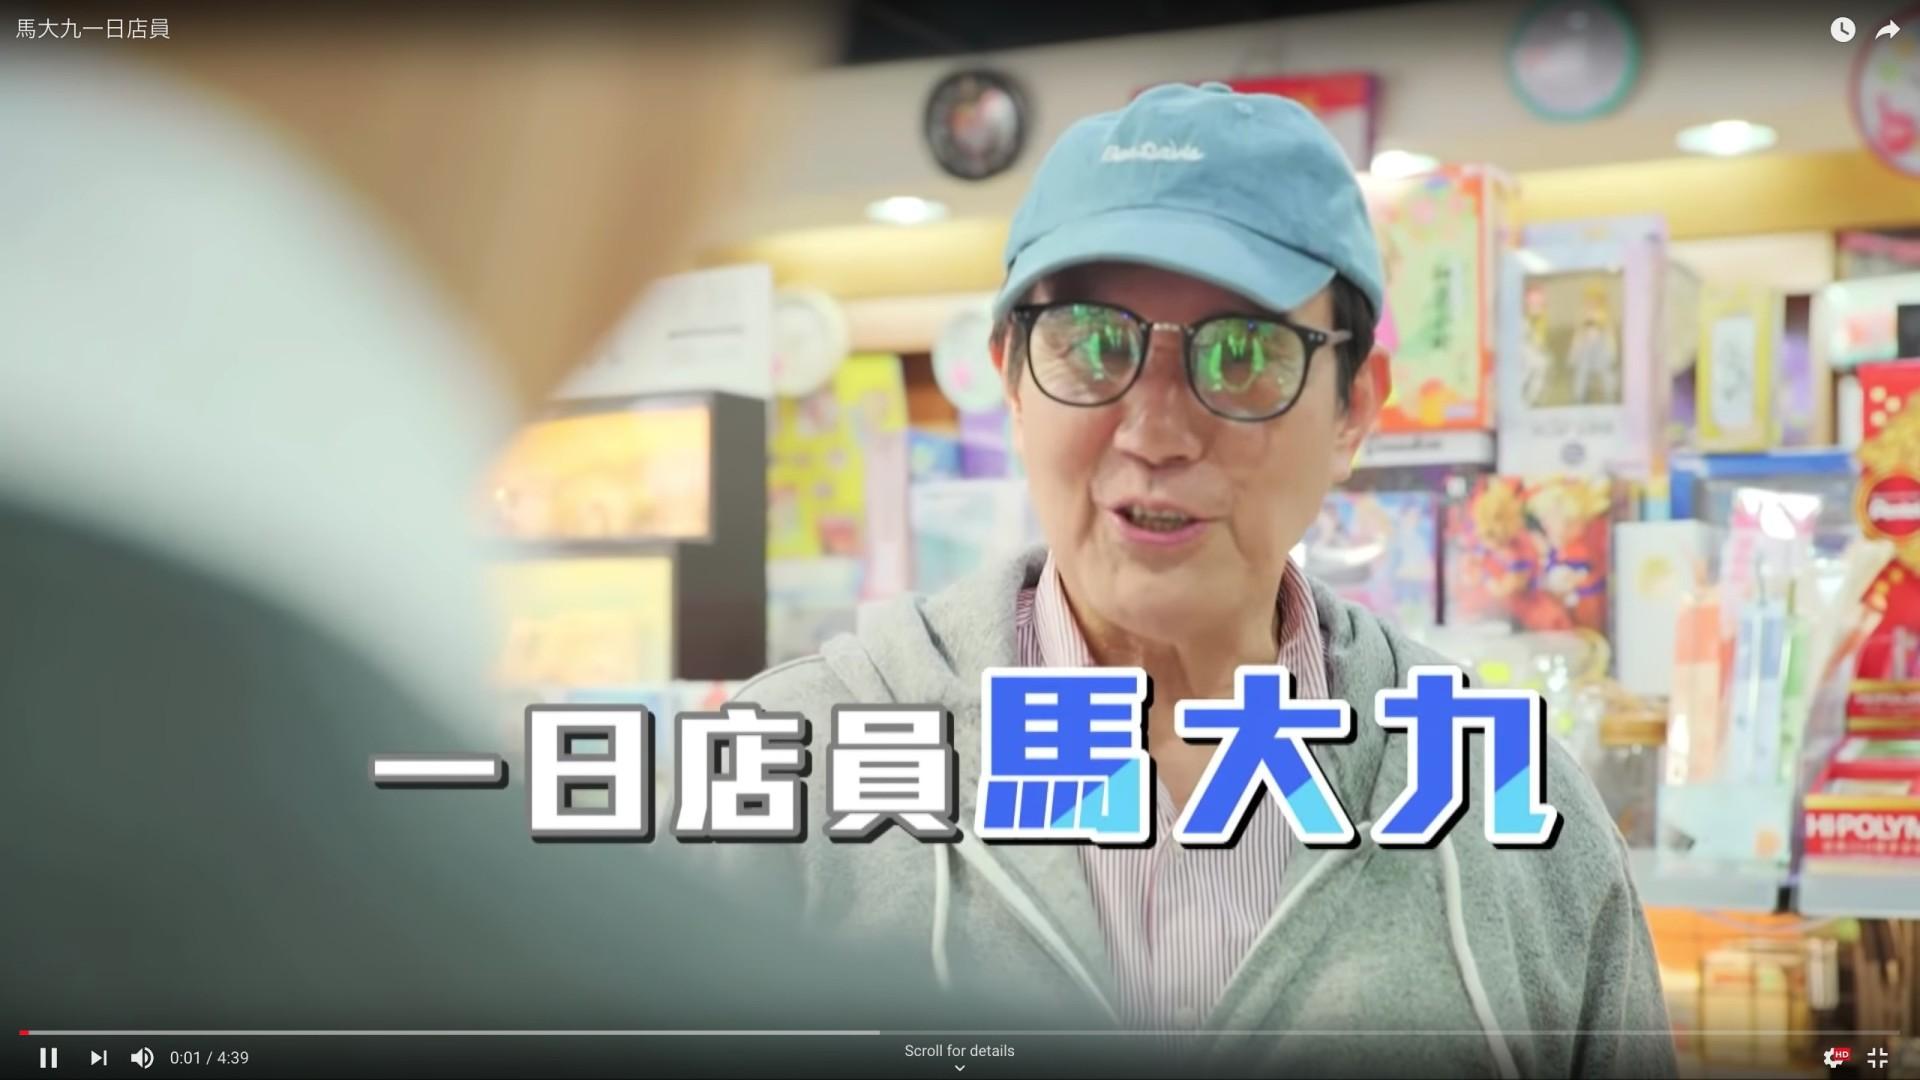 Former Taiwan president Ma Ying-jeou appears in video as 'shopkeeper